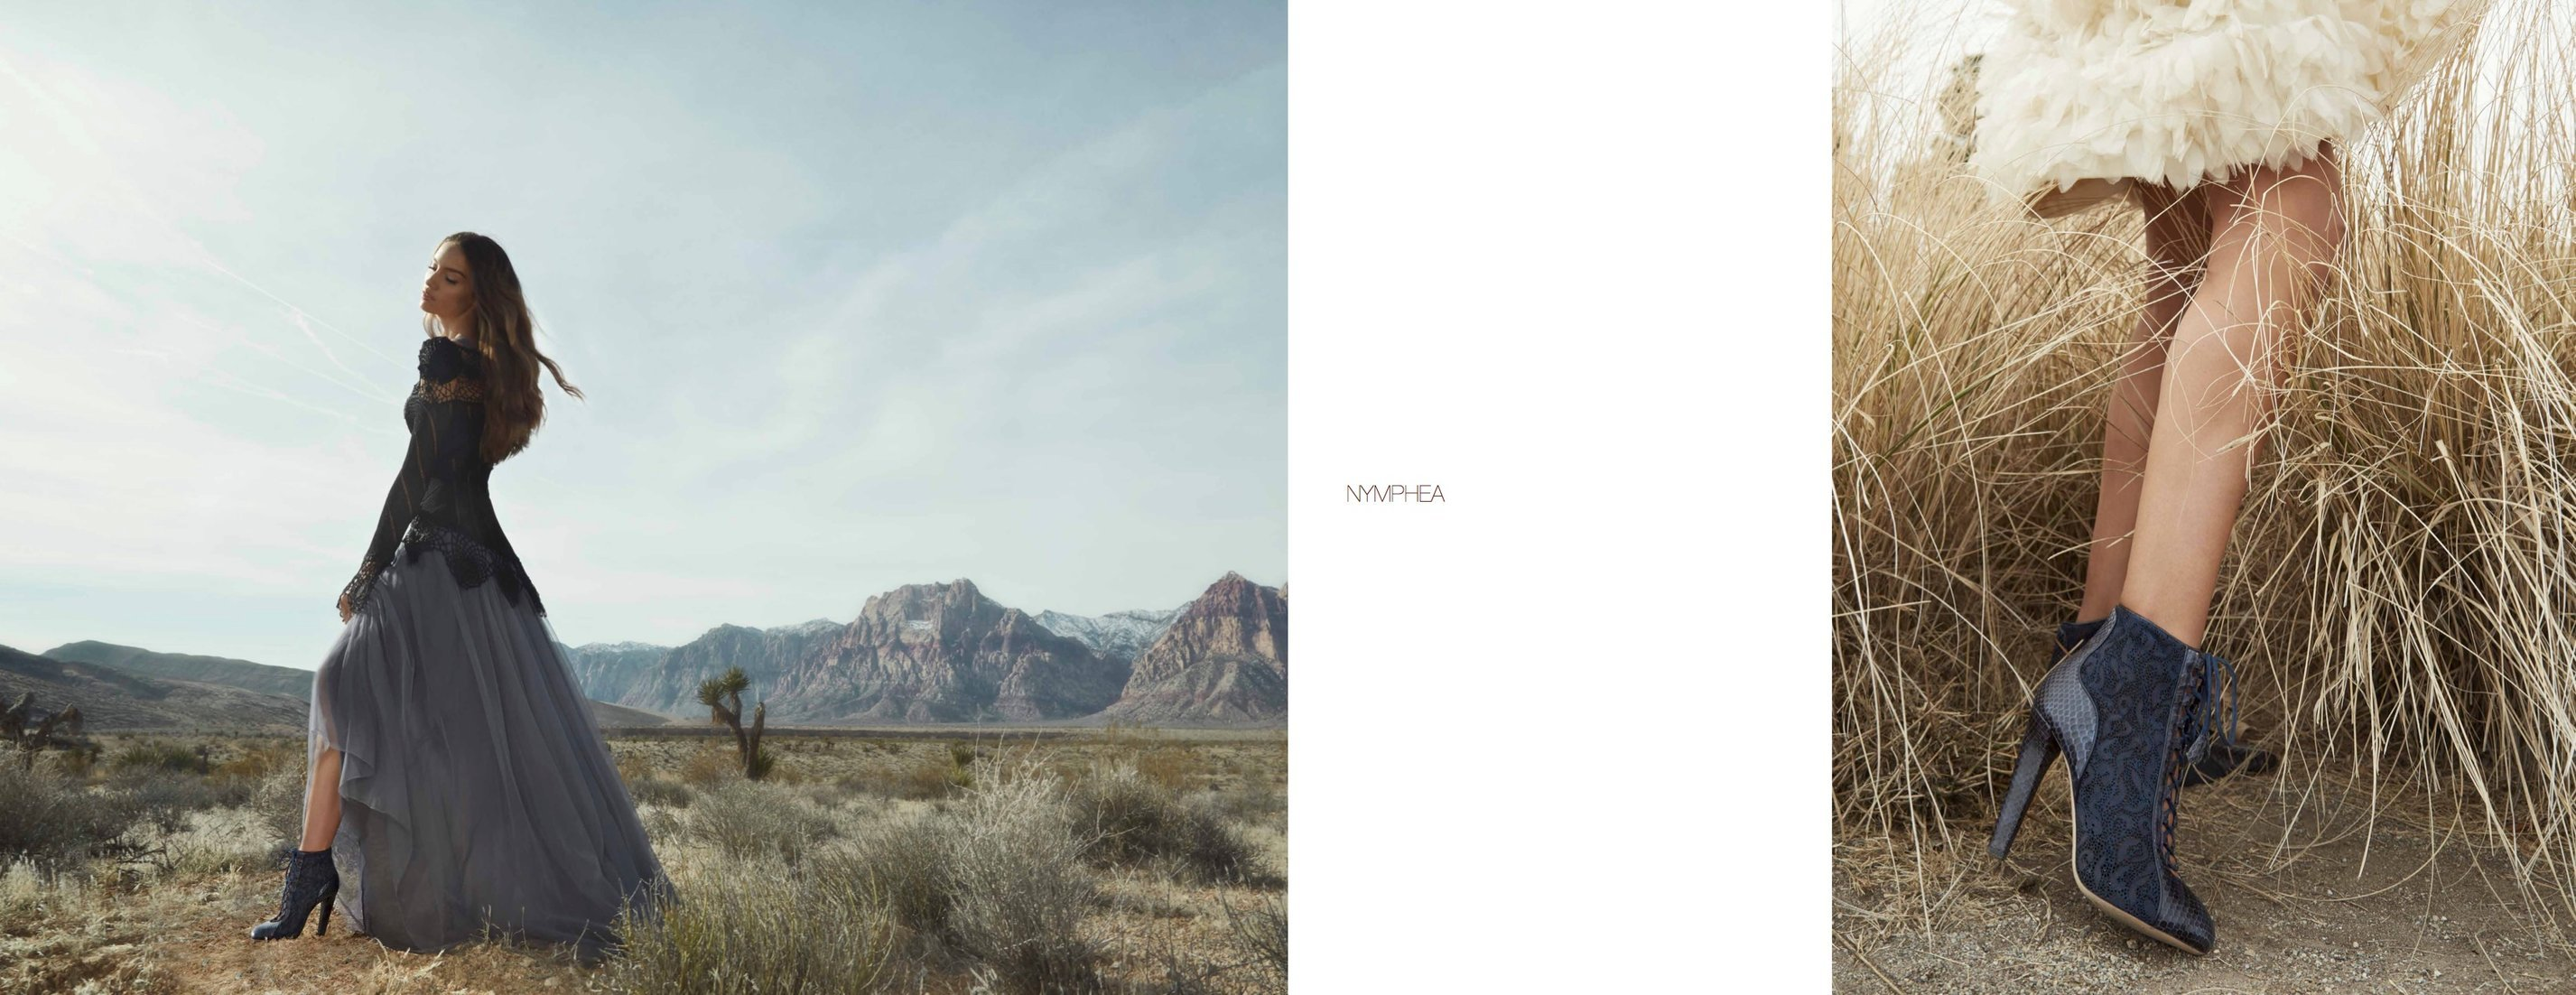 ChloeGosselin-FW17-lookbook1 2.jpg